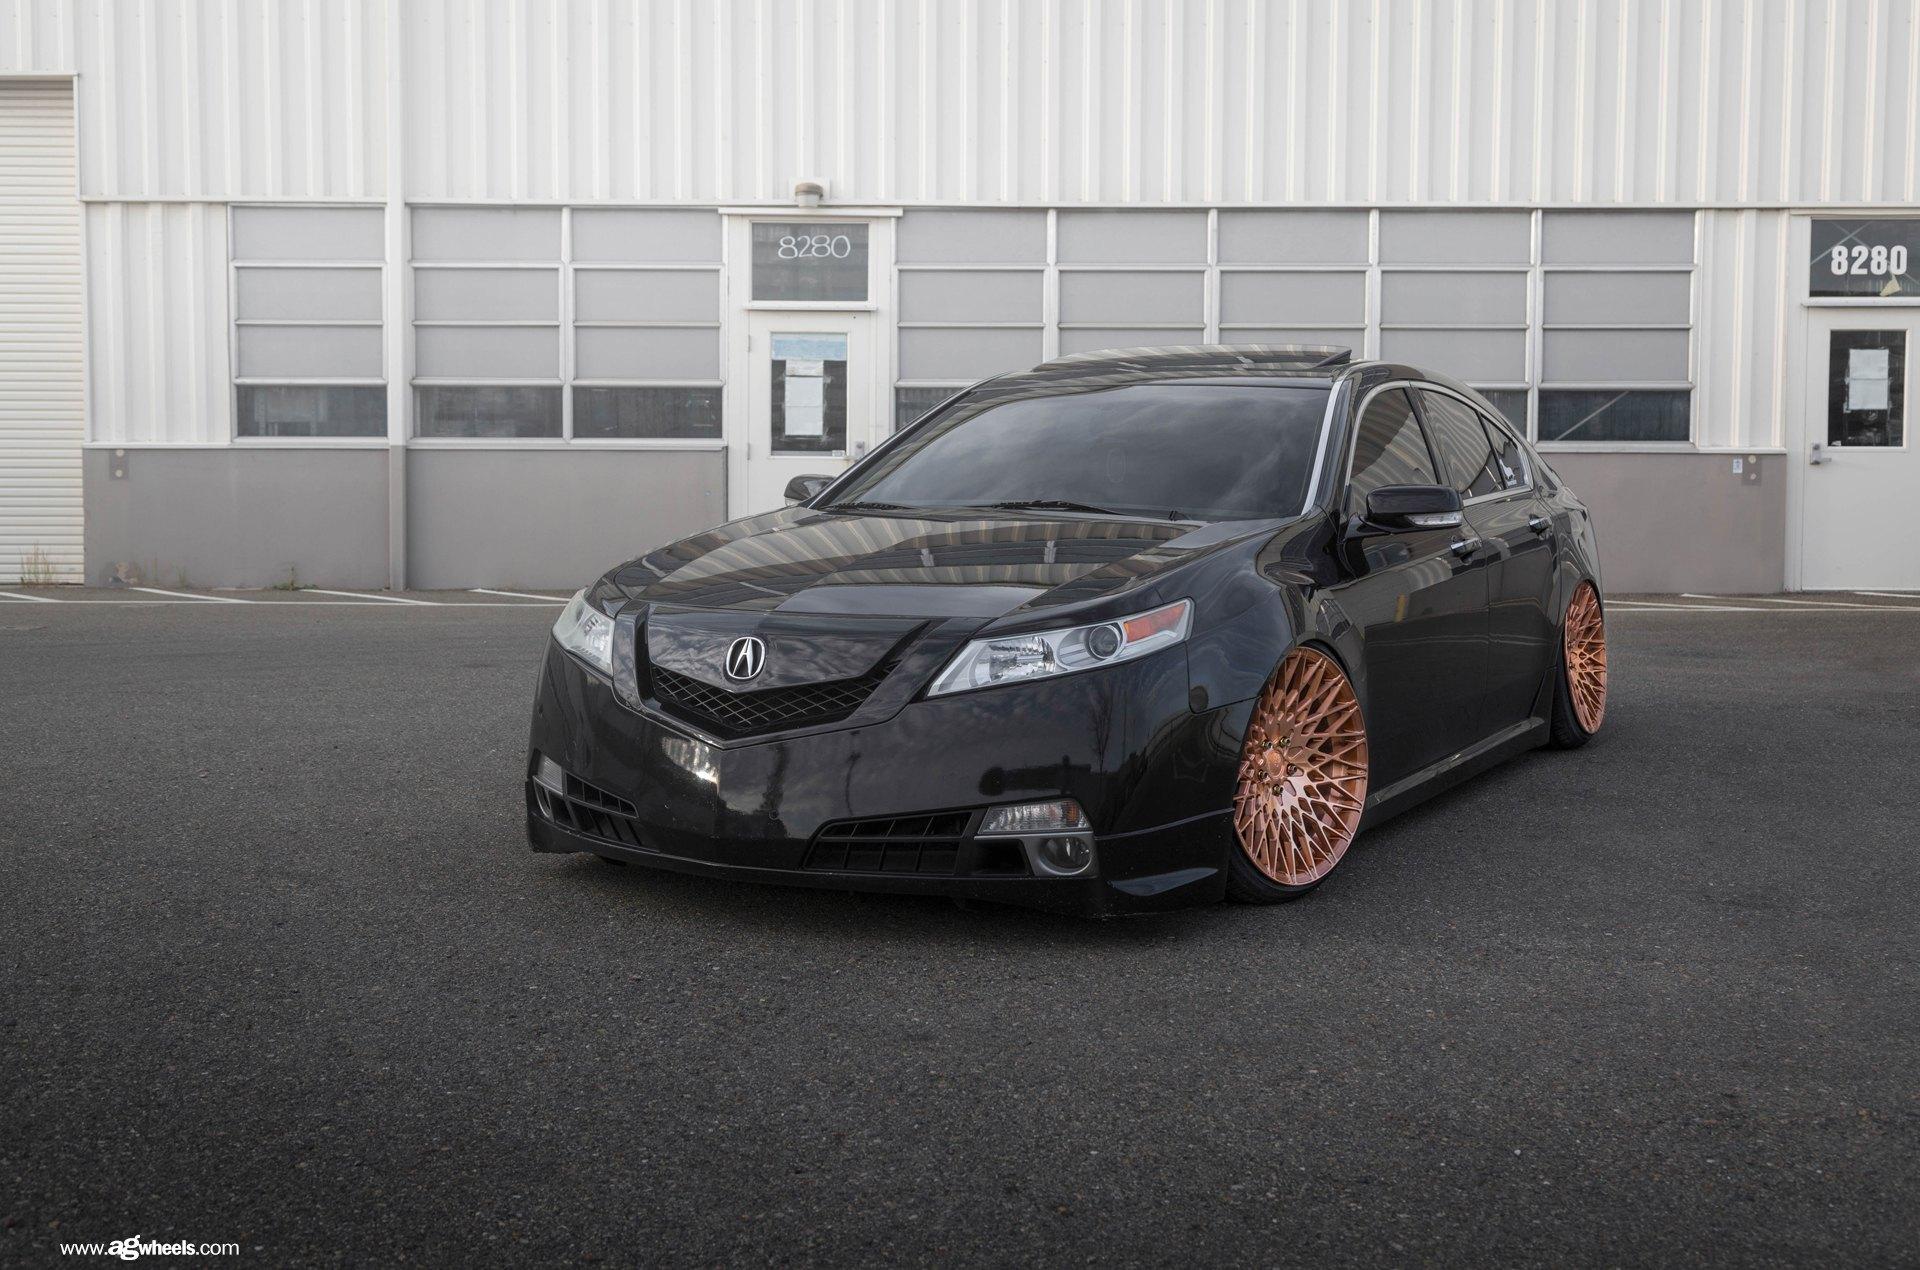 Slammed Acura Tl On Copper Rims By Avant Garde Carid Com Gallery